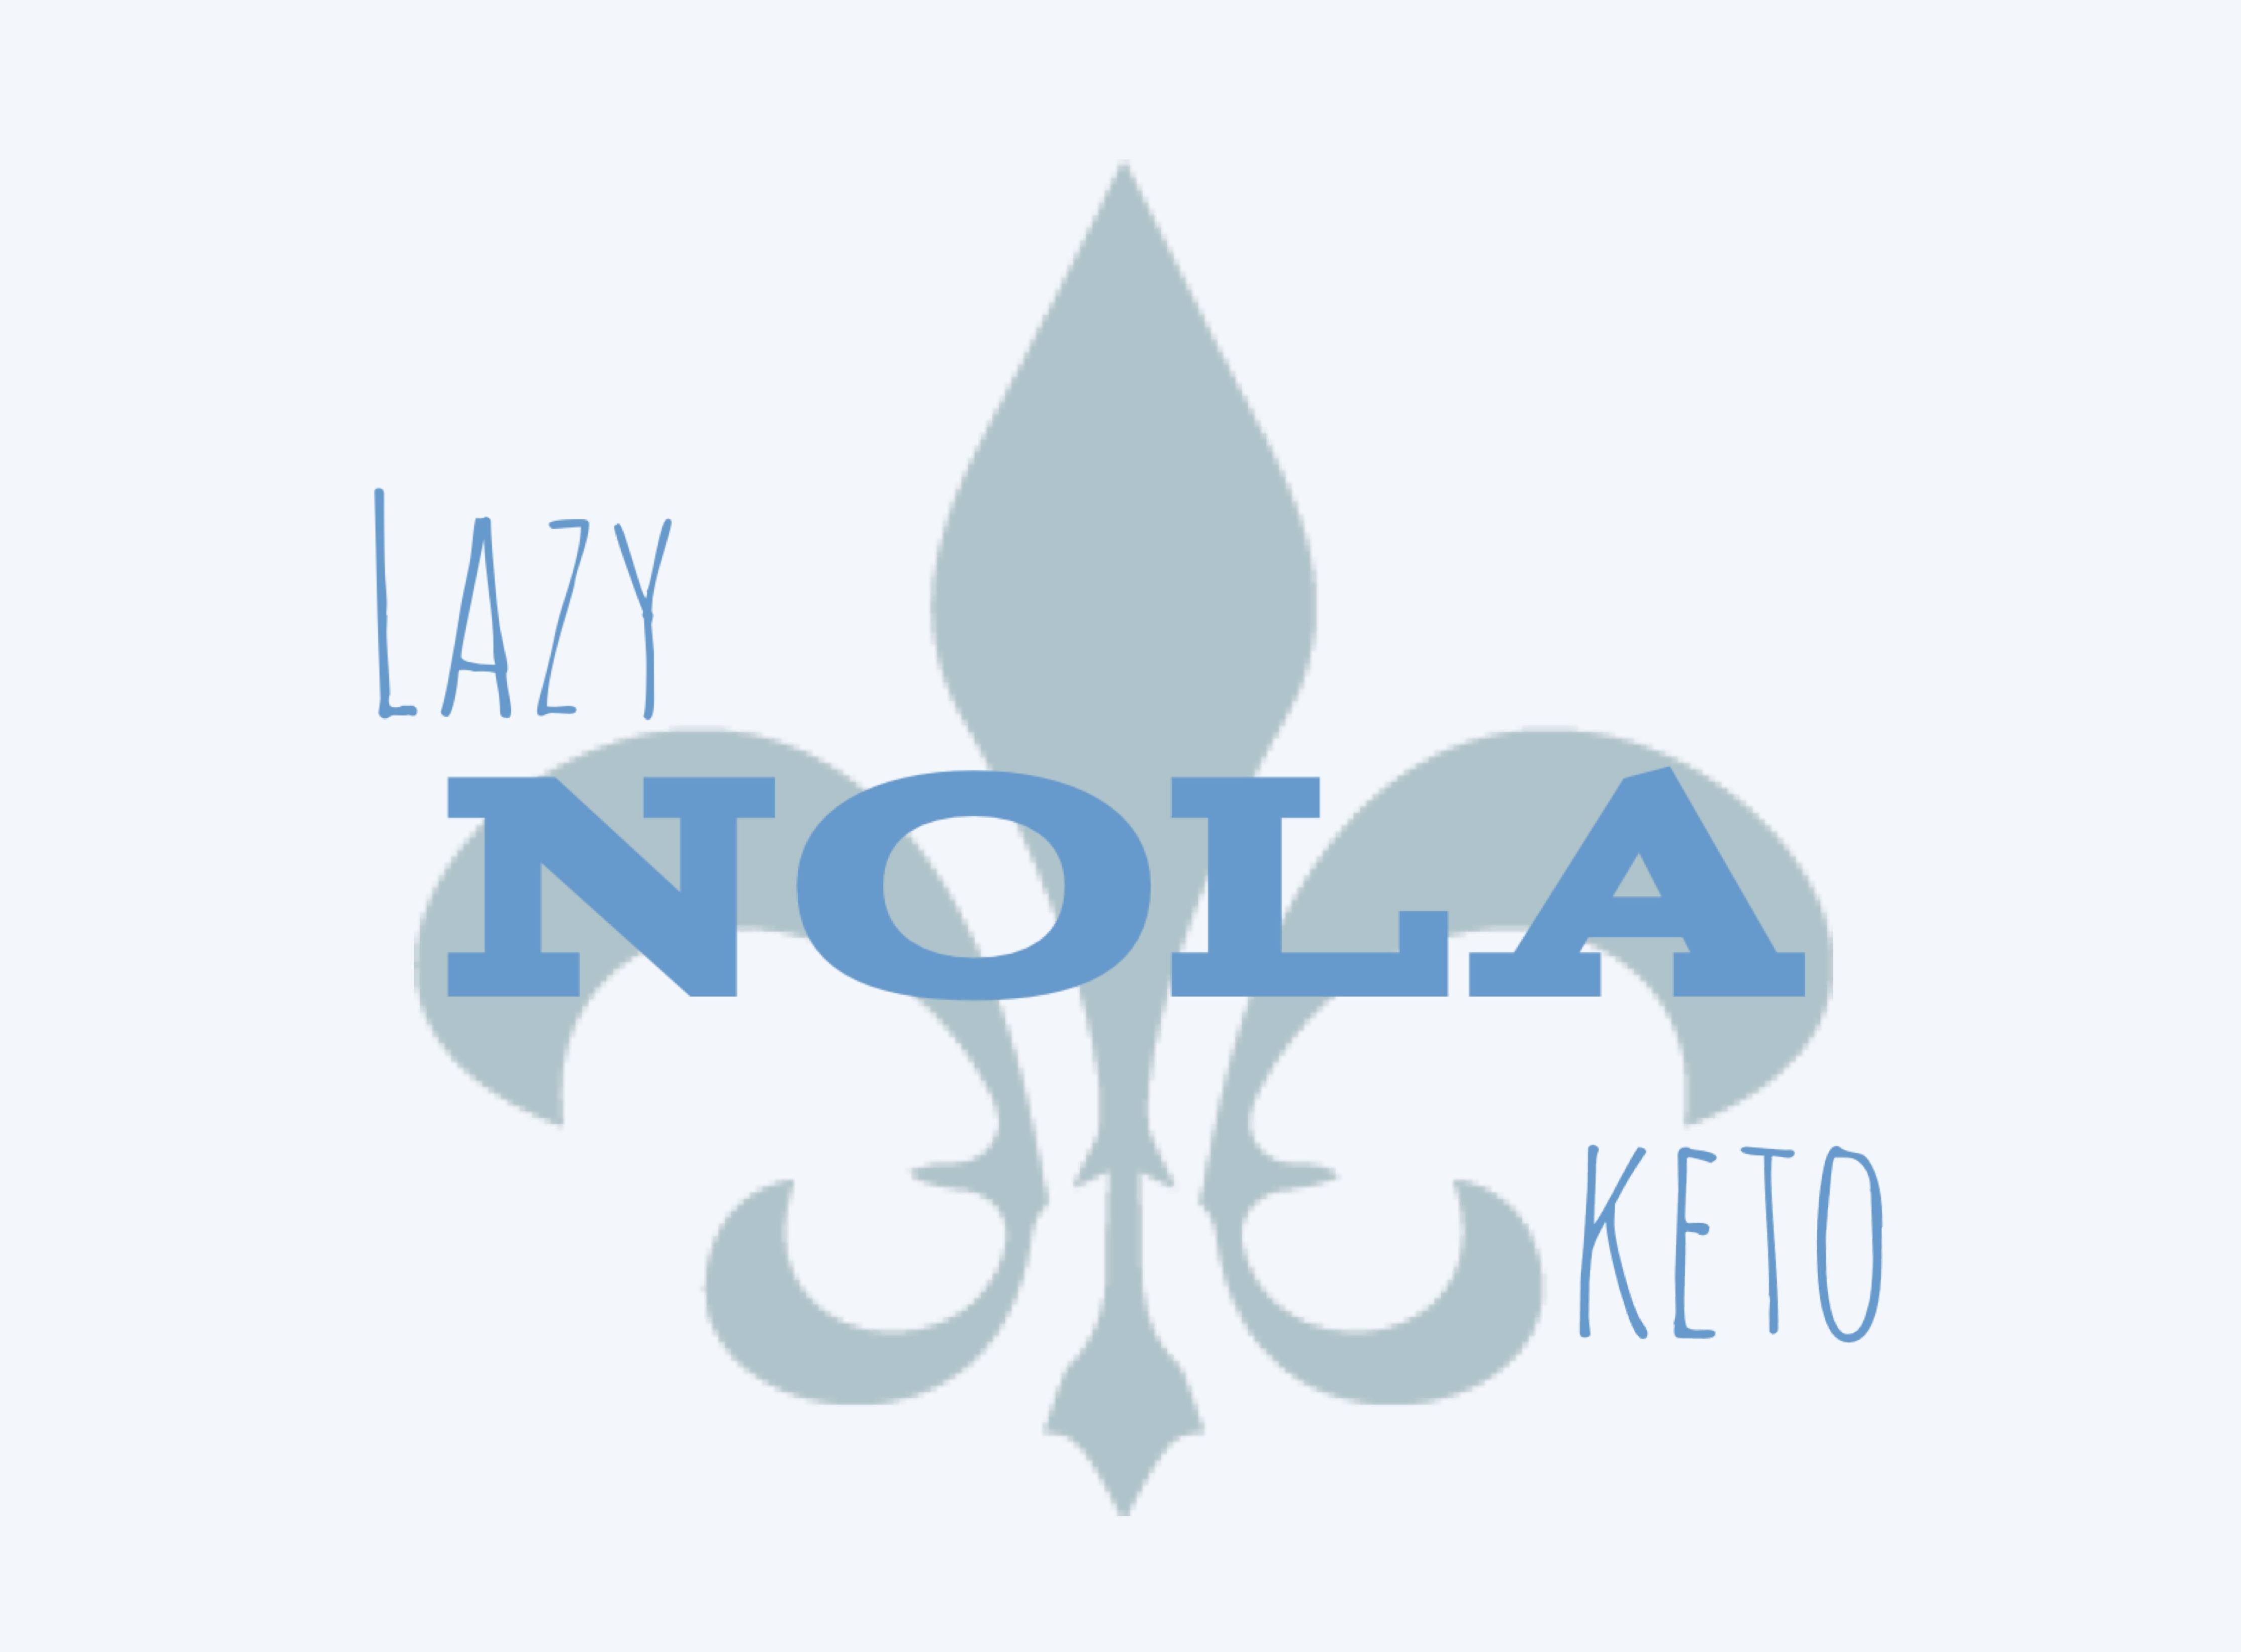 Lazy NOLA Keto